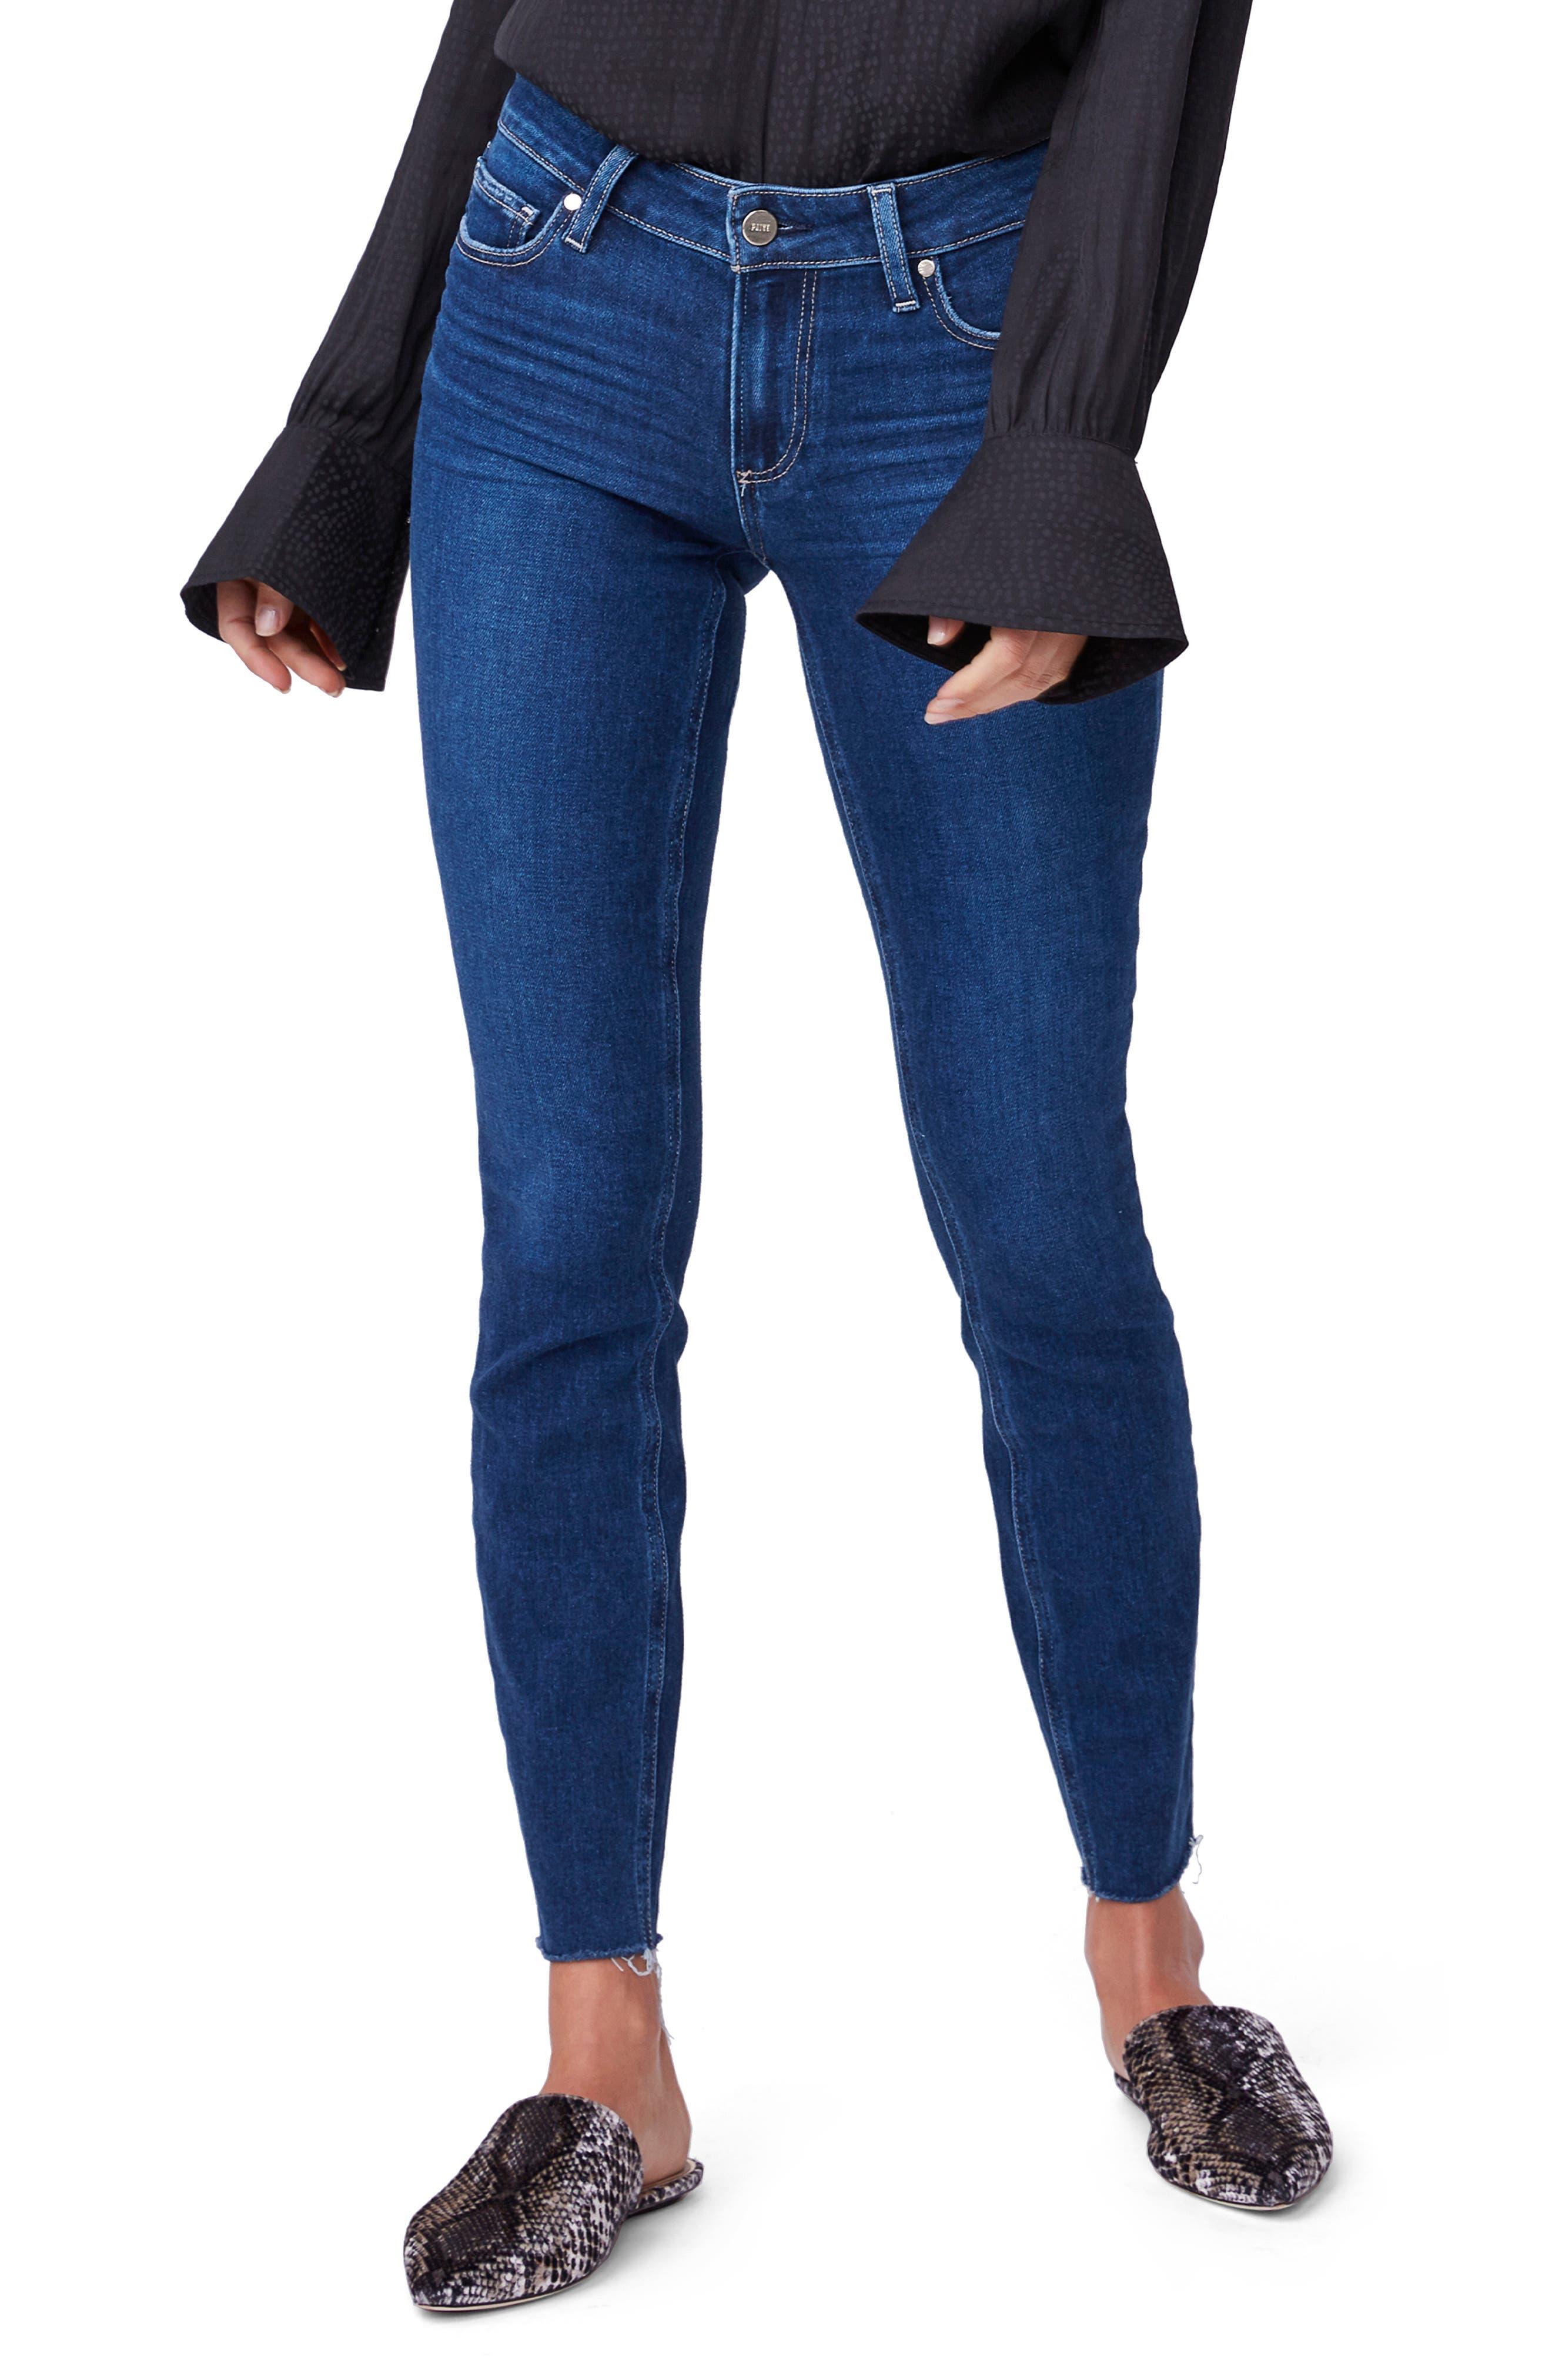 Image of PAIGE Verdugo Ankle Raw Hem Jeans